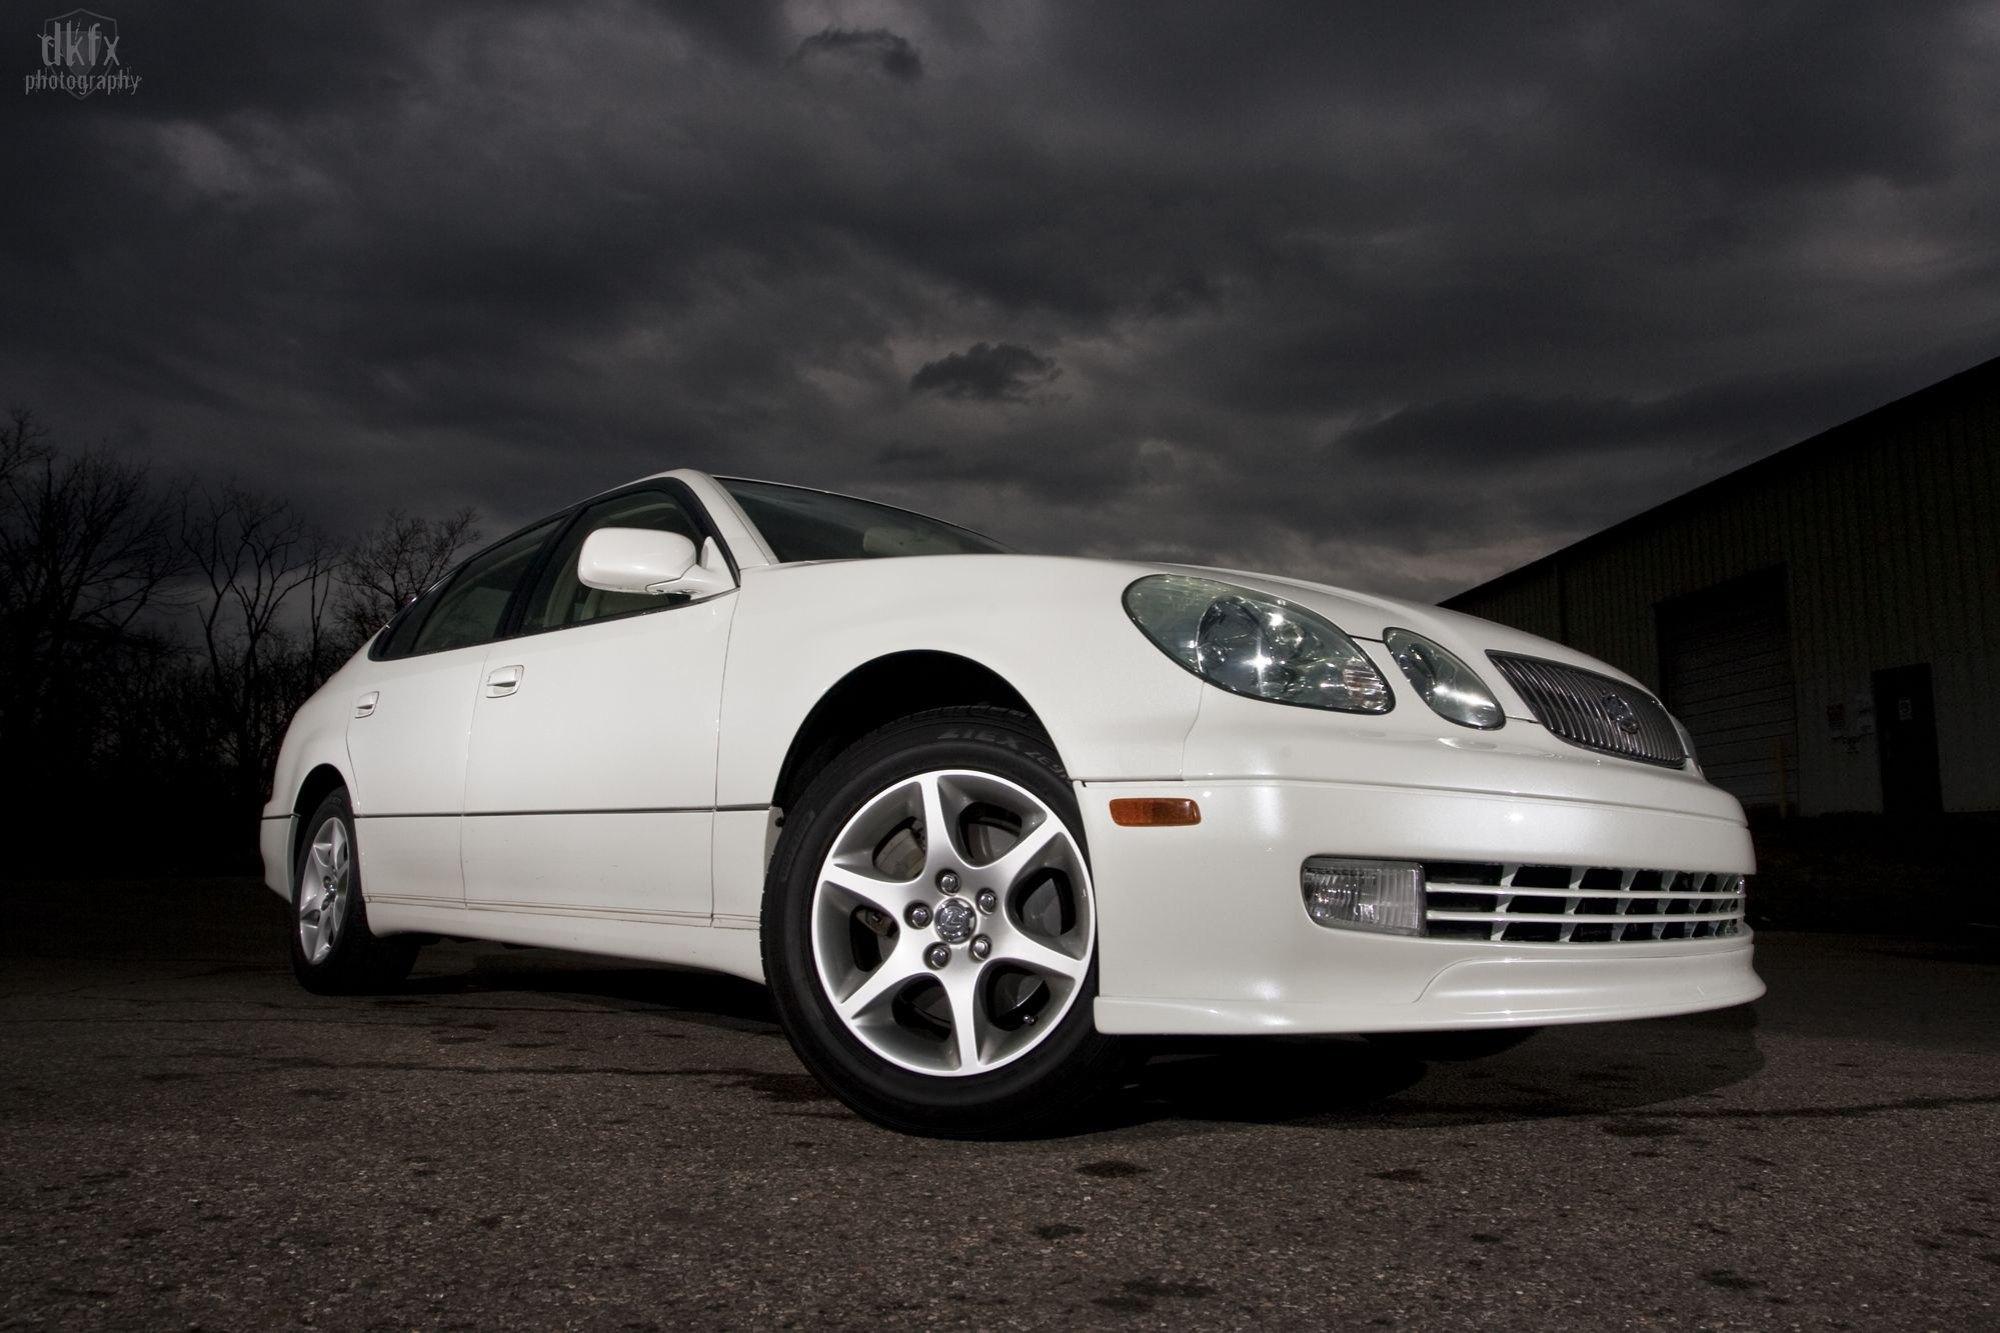 hight resolution of custom 1998 lexus gs images mods photos upgrades carid com gallery